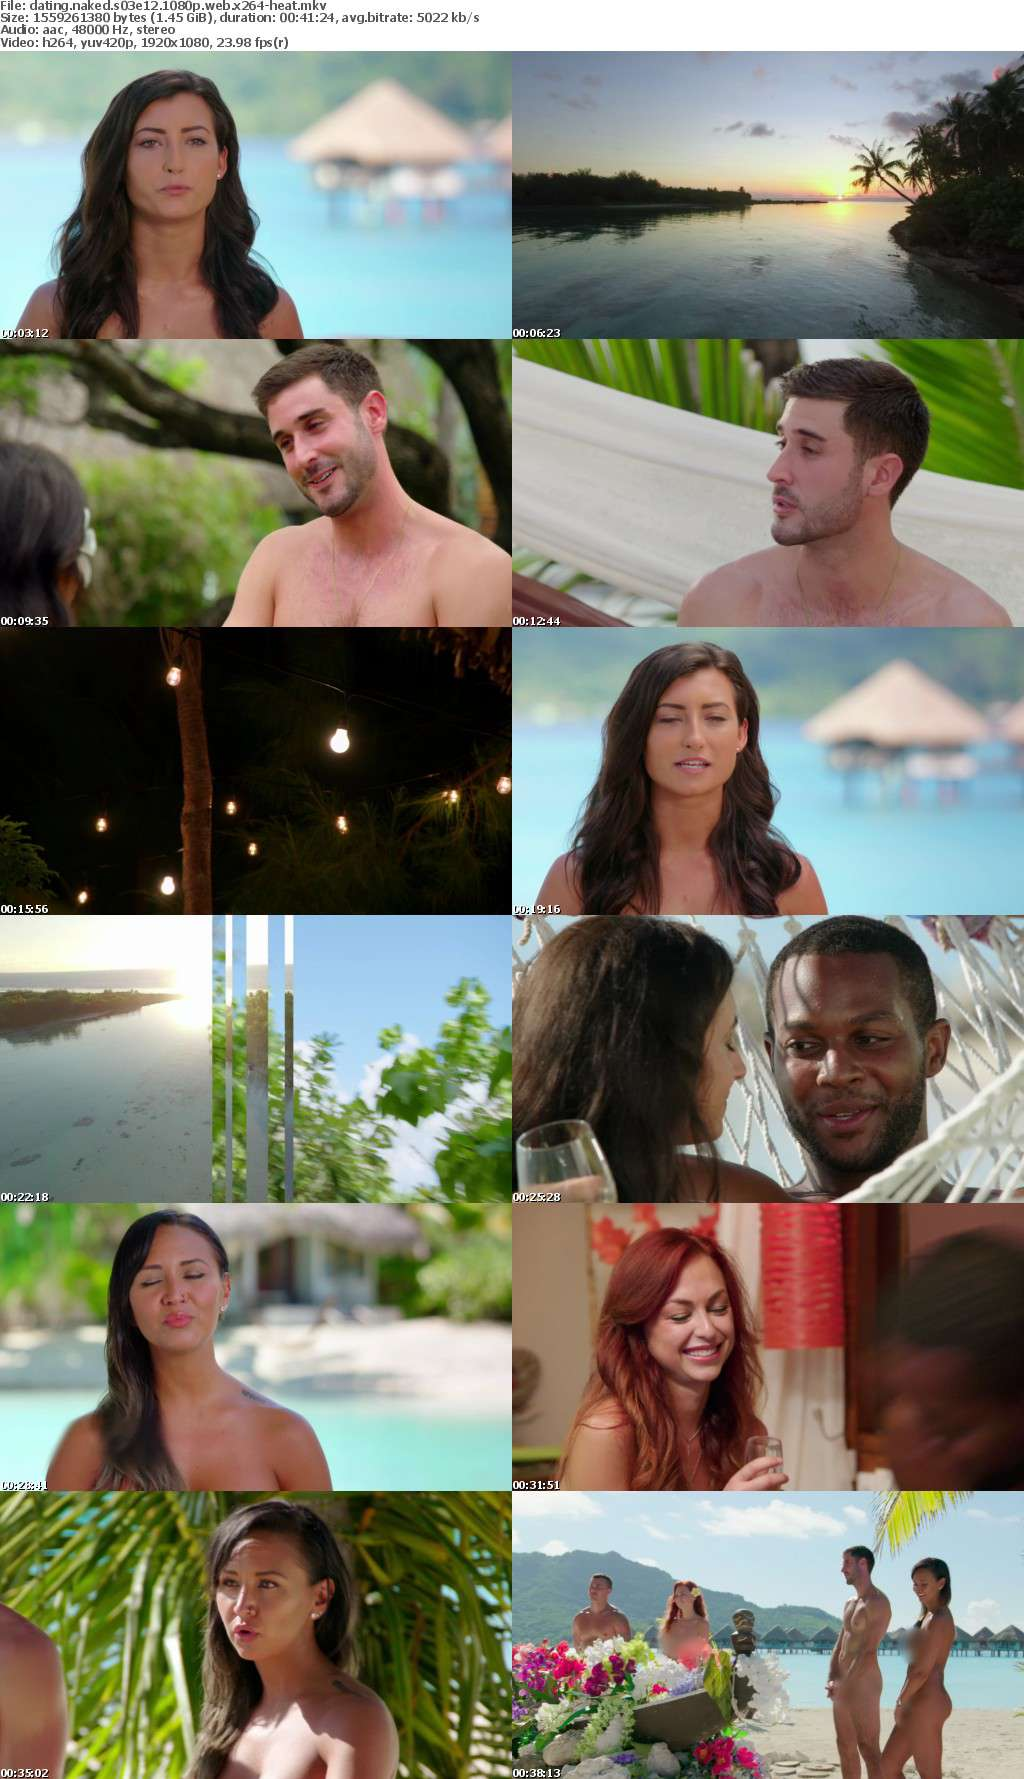 Dating Naked S03E12 1080p WEB x264-HEAT